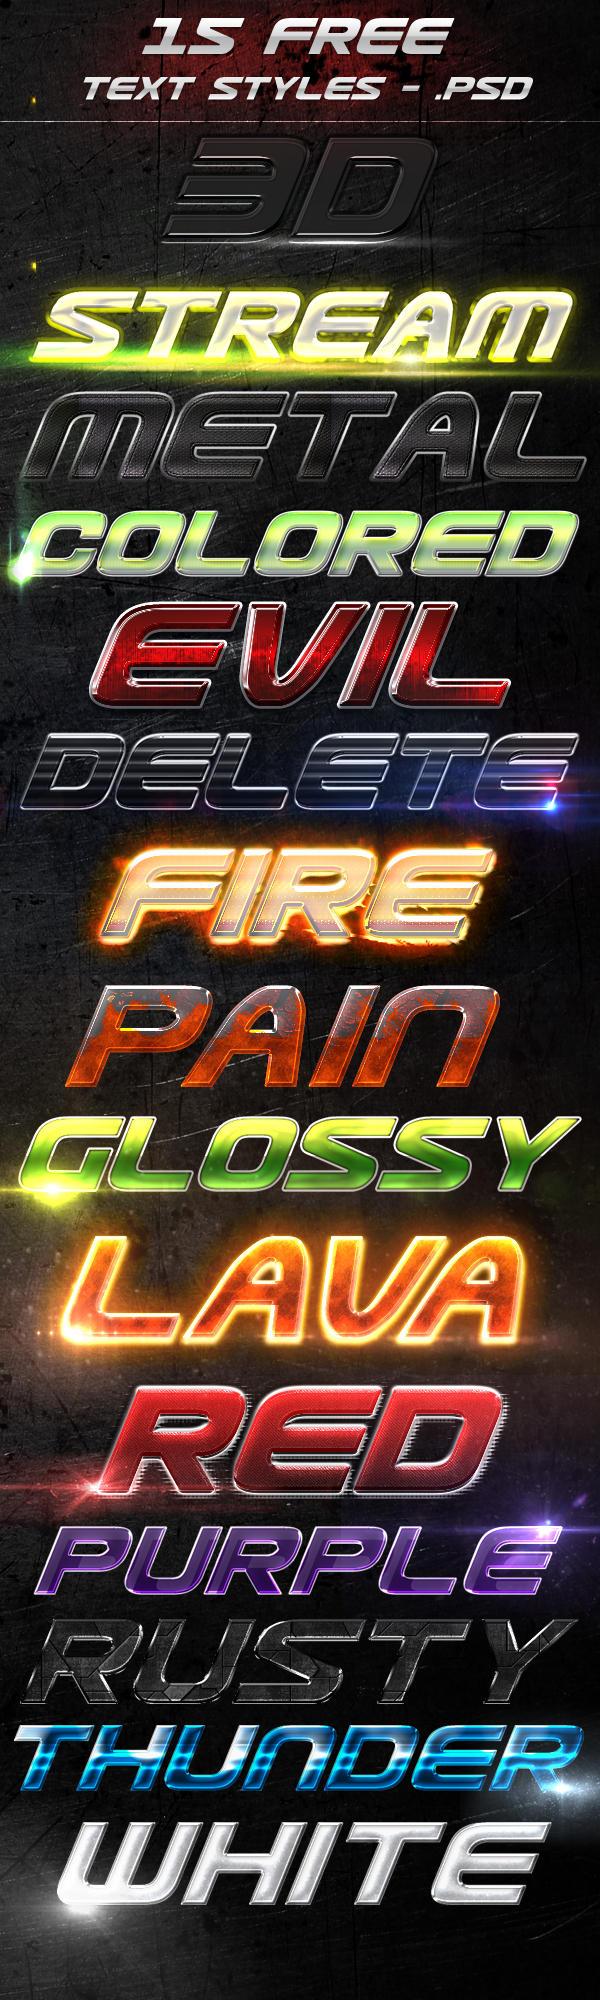 http://fc00.deviantart.net/fs71/i/2011/251/a/8/text_styles__psd_2_by_t1na-d498t9f.jpg